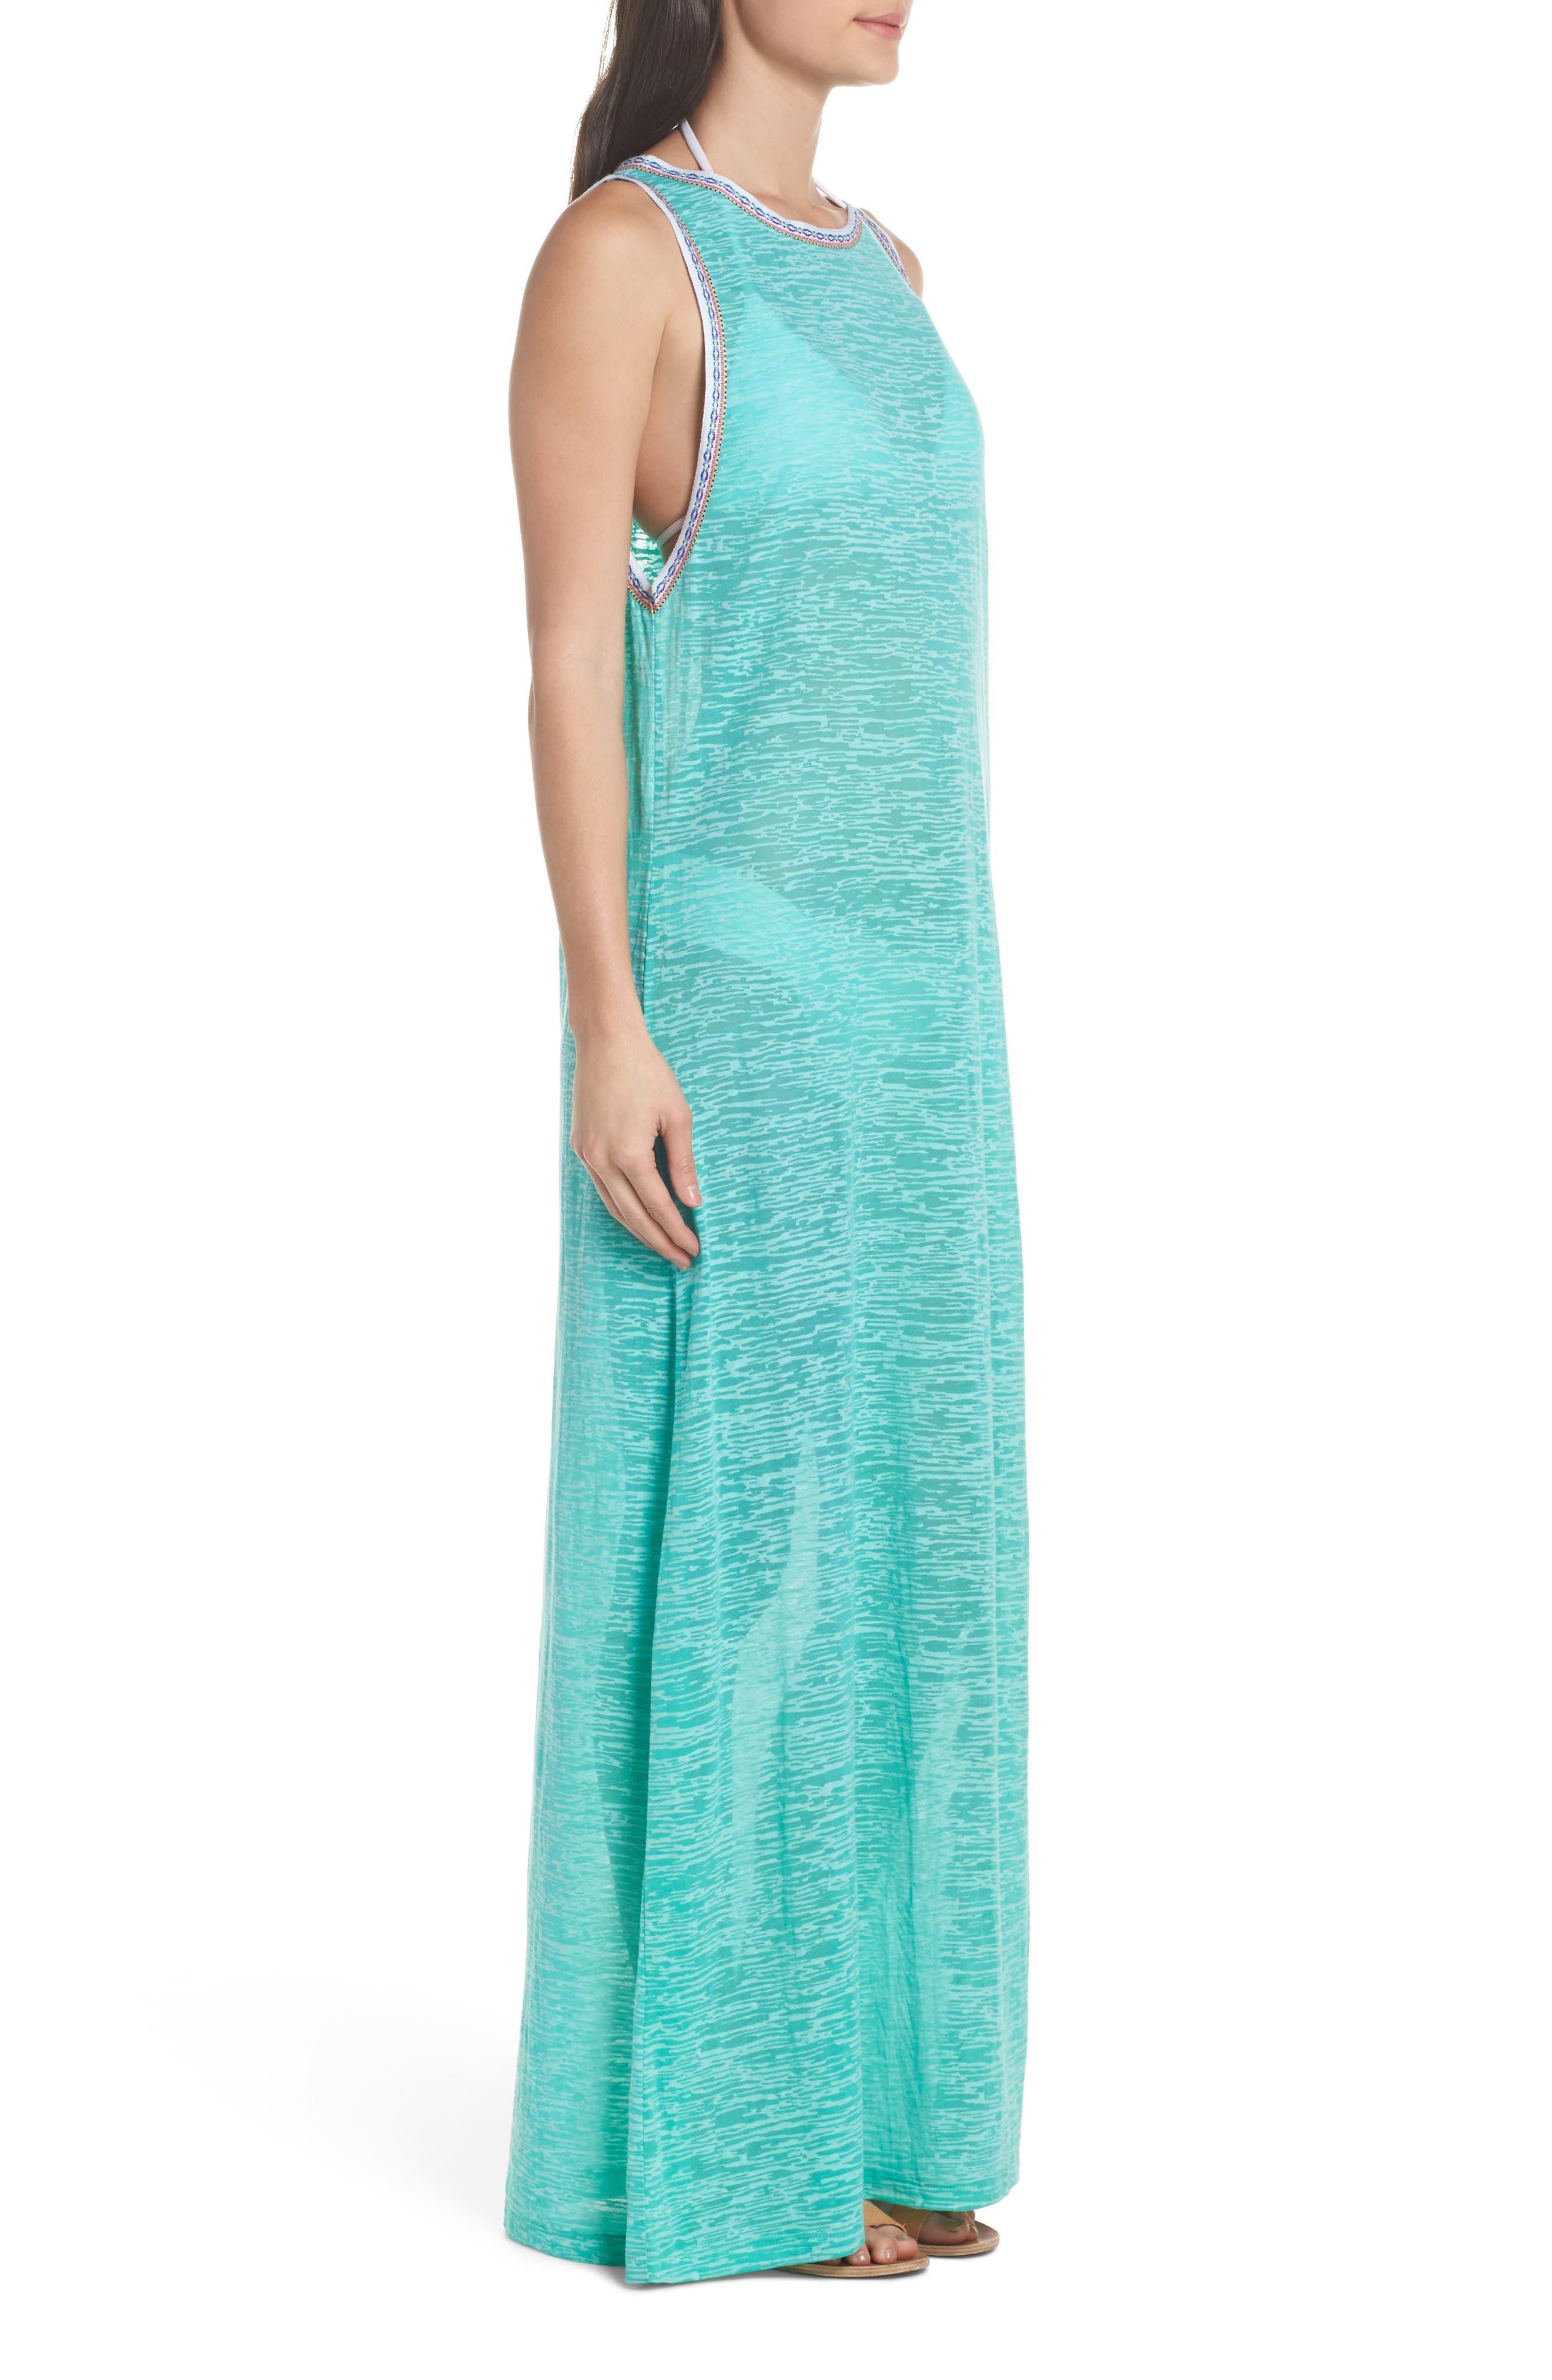 Tassel Slit Cover-Up Maxi Dress,                             Alternate thumbnail 3, color,                             Mint